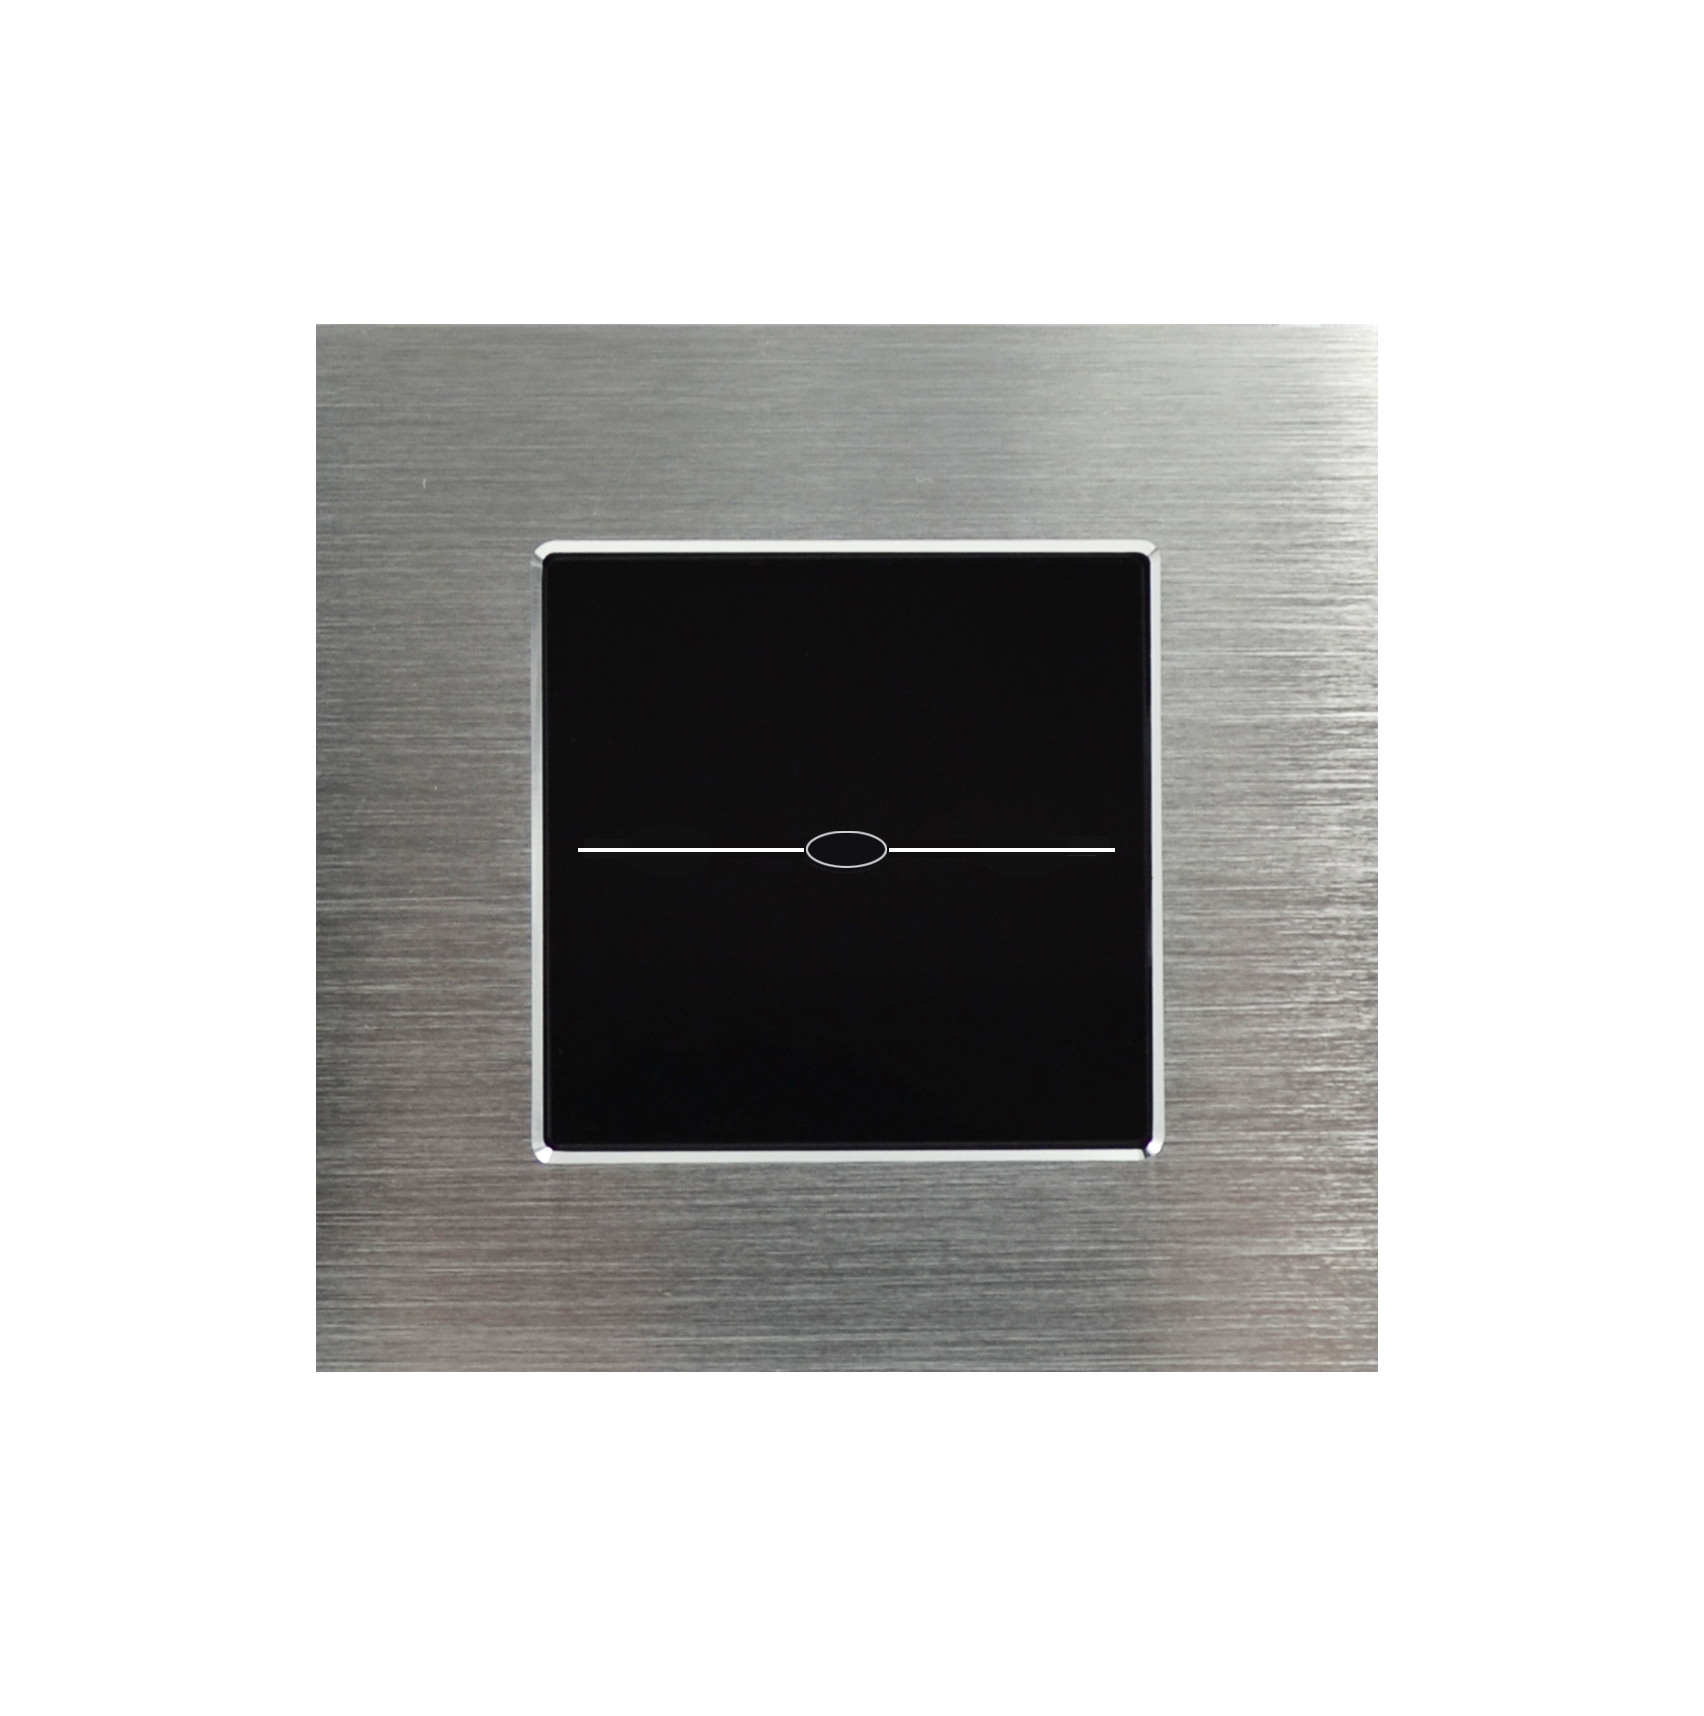 lichtschalter aluminiumrahmen glas touchscreen. Black Bedroom Furniture Sets. Home Design Ideas